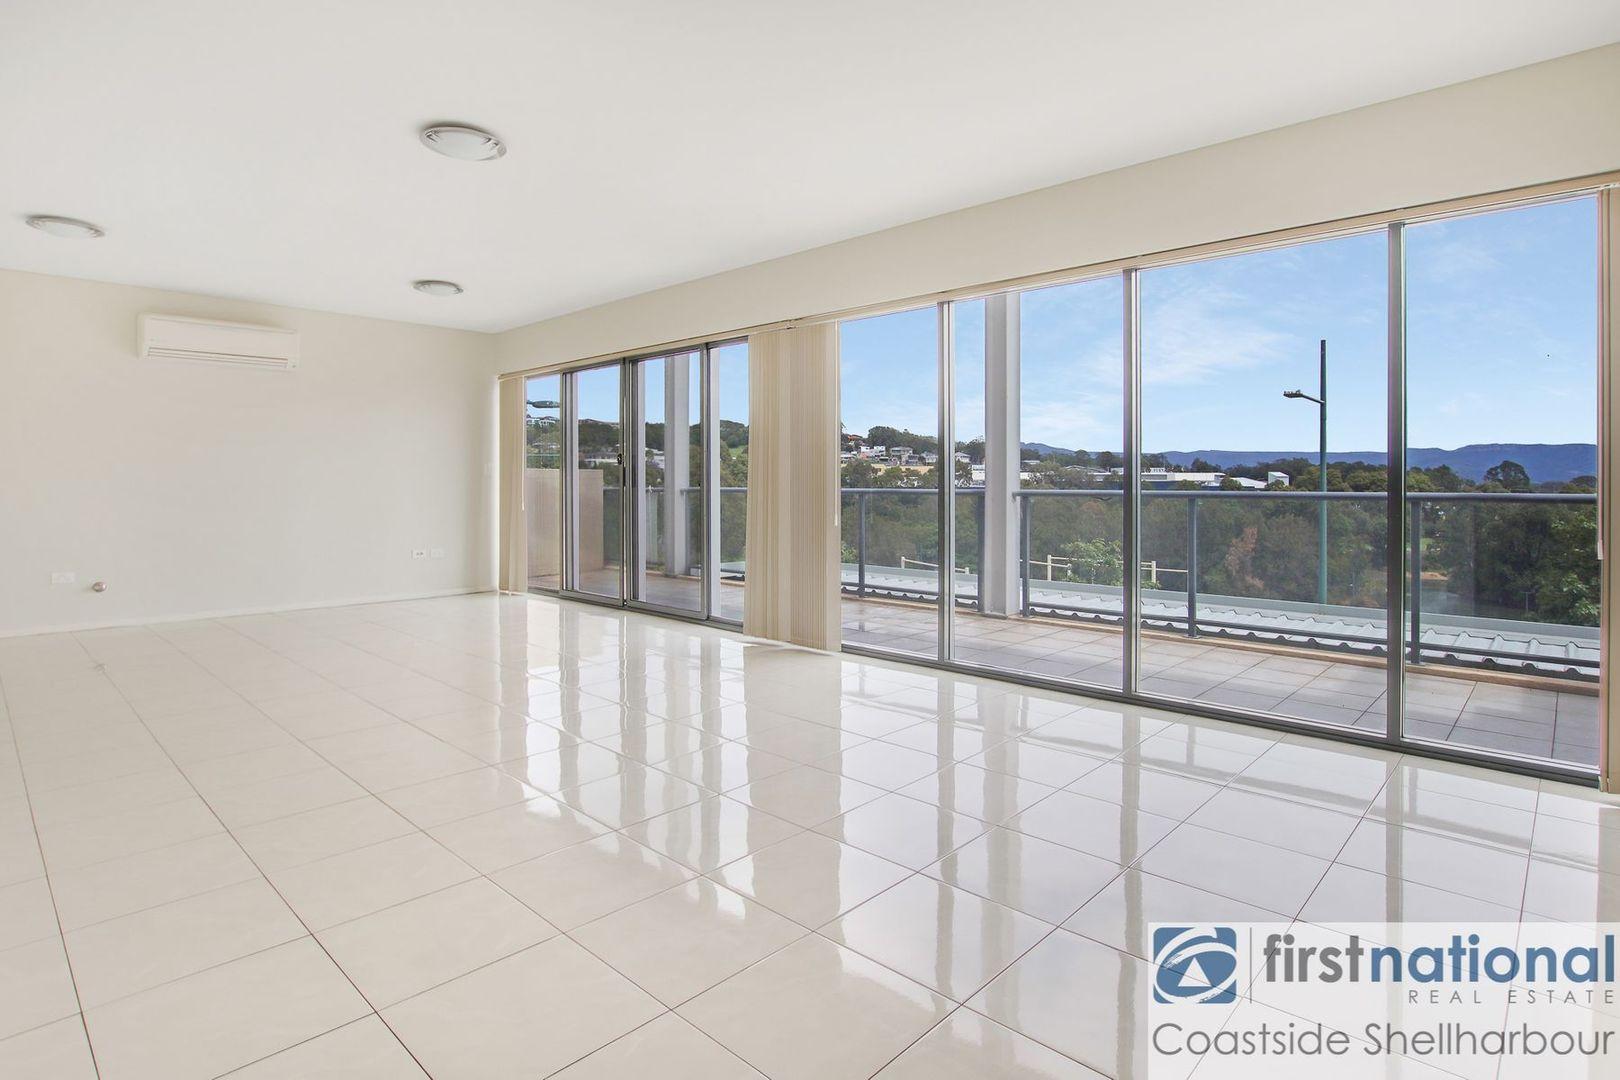 1/7 Minga Avenue, Shellharbour City Centre NSW 2529, Image 2